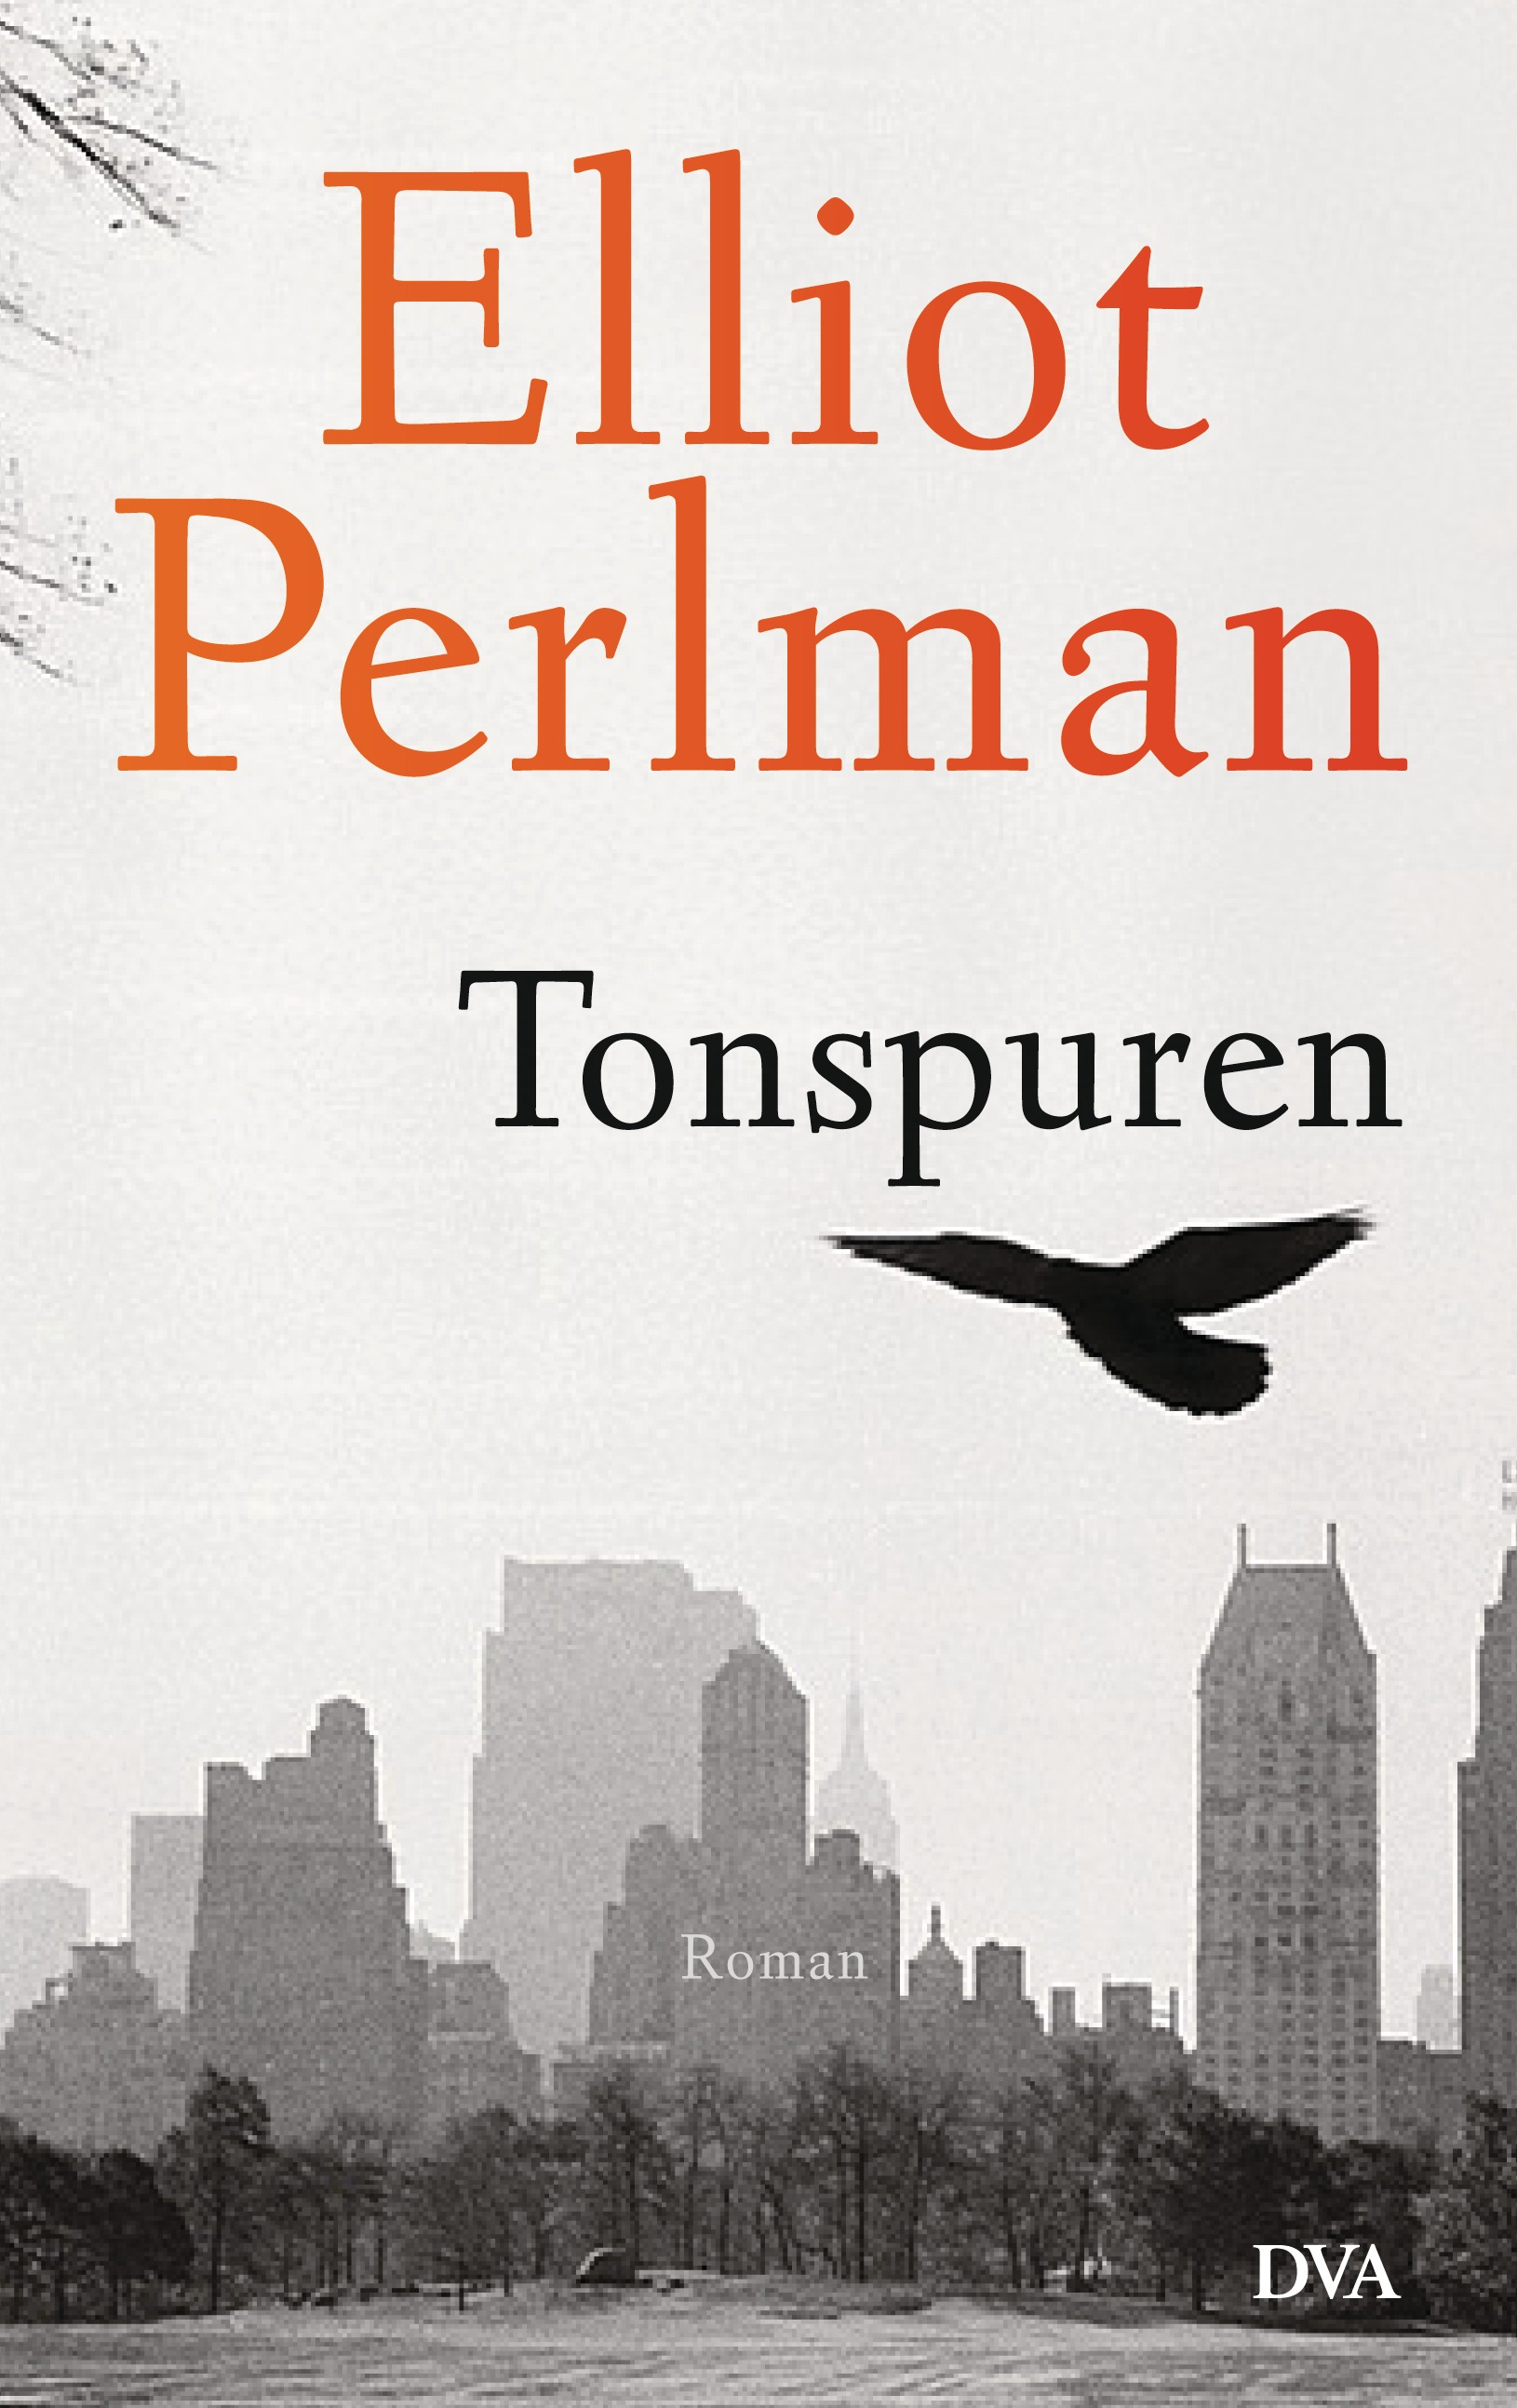 Elliot Perlman - Tonspuren Cover